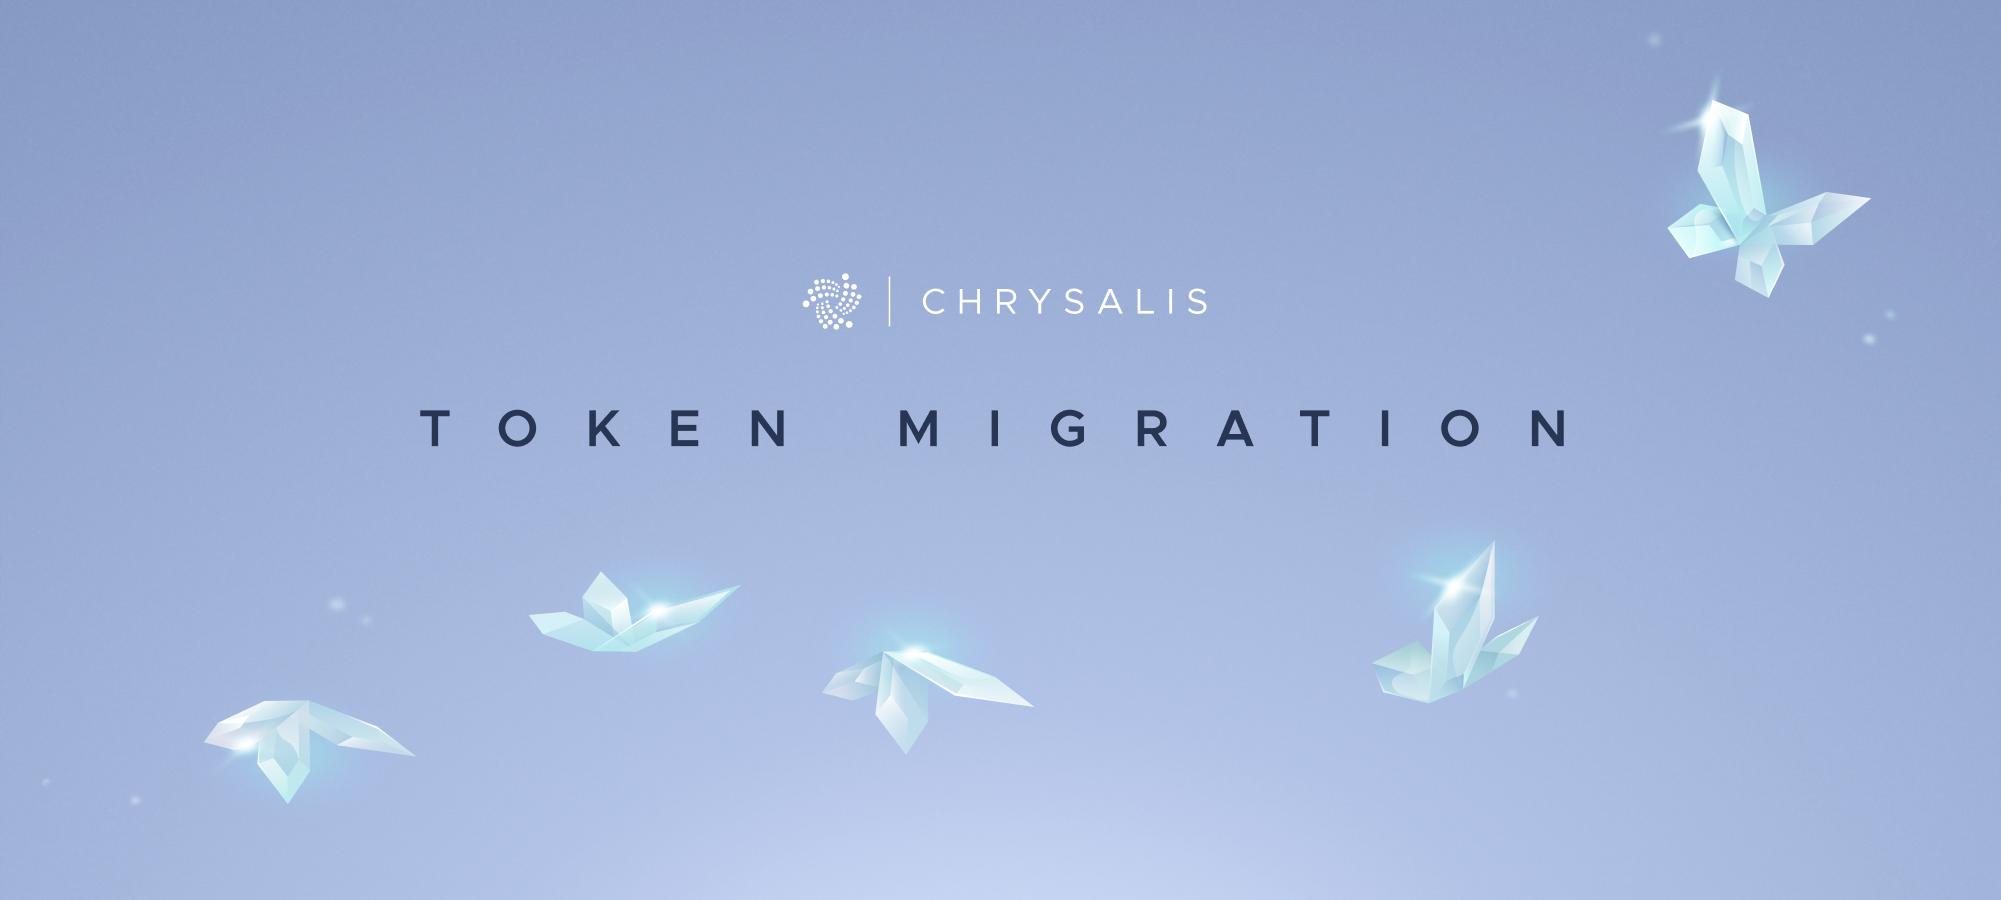 The Chrysalis Token Migration Starts Now!